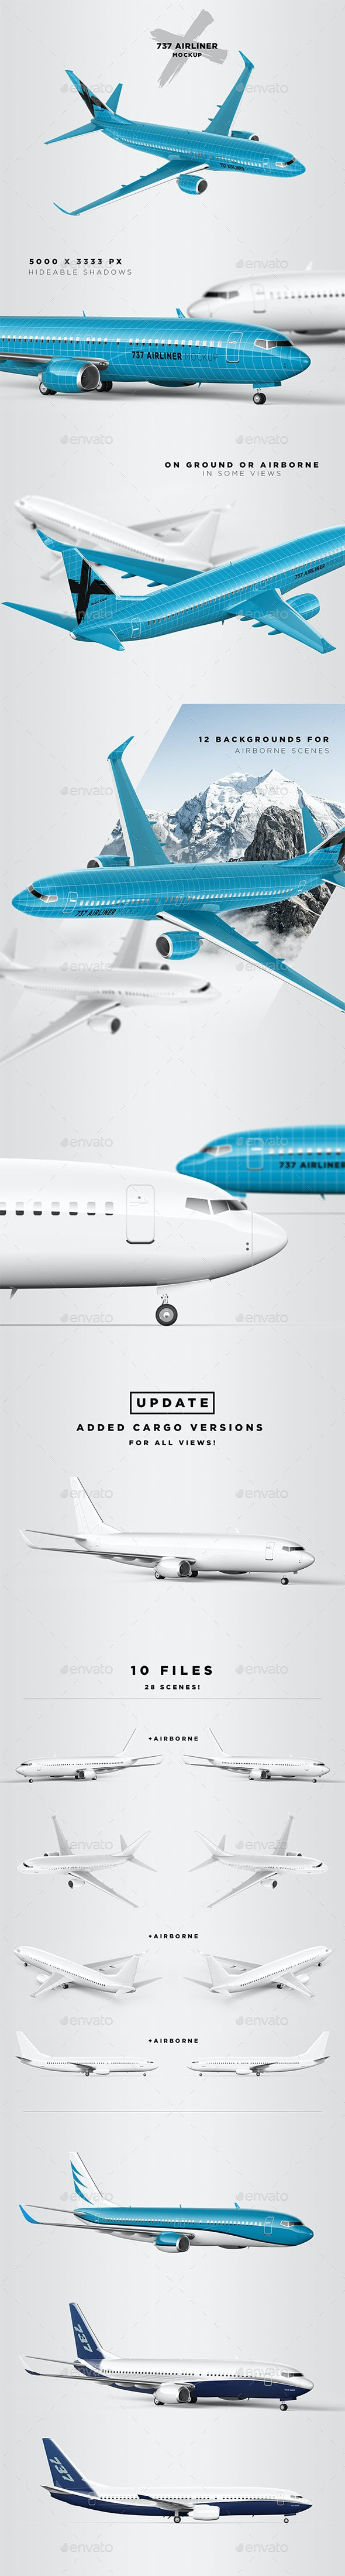 737 Jet Airliner Mockup - Passenger & Cargo - Vehicle Wraps Print